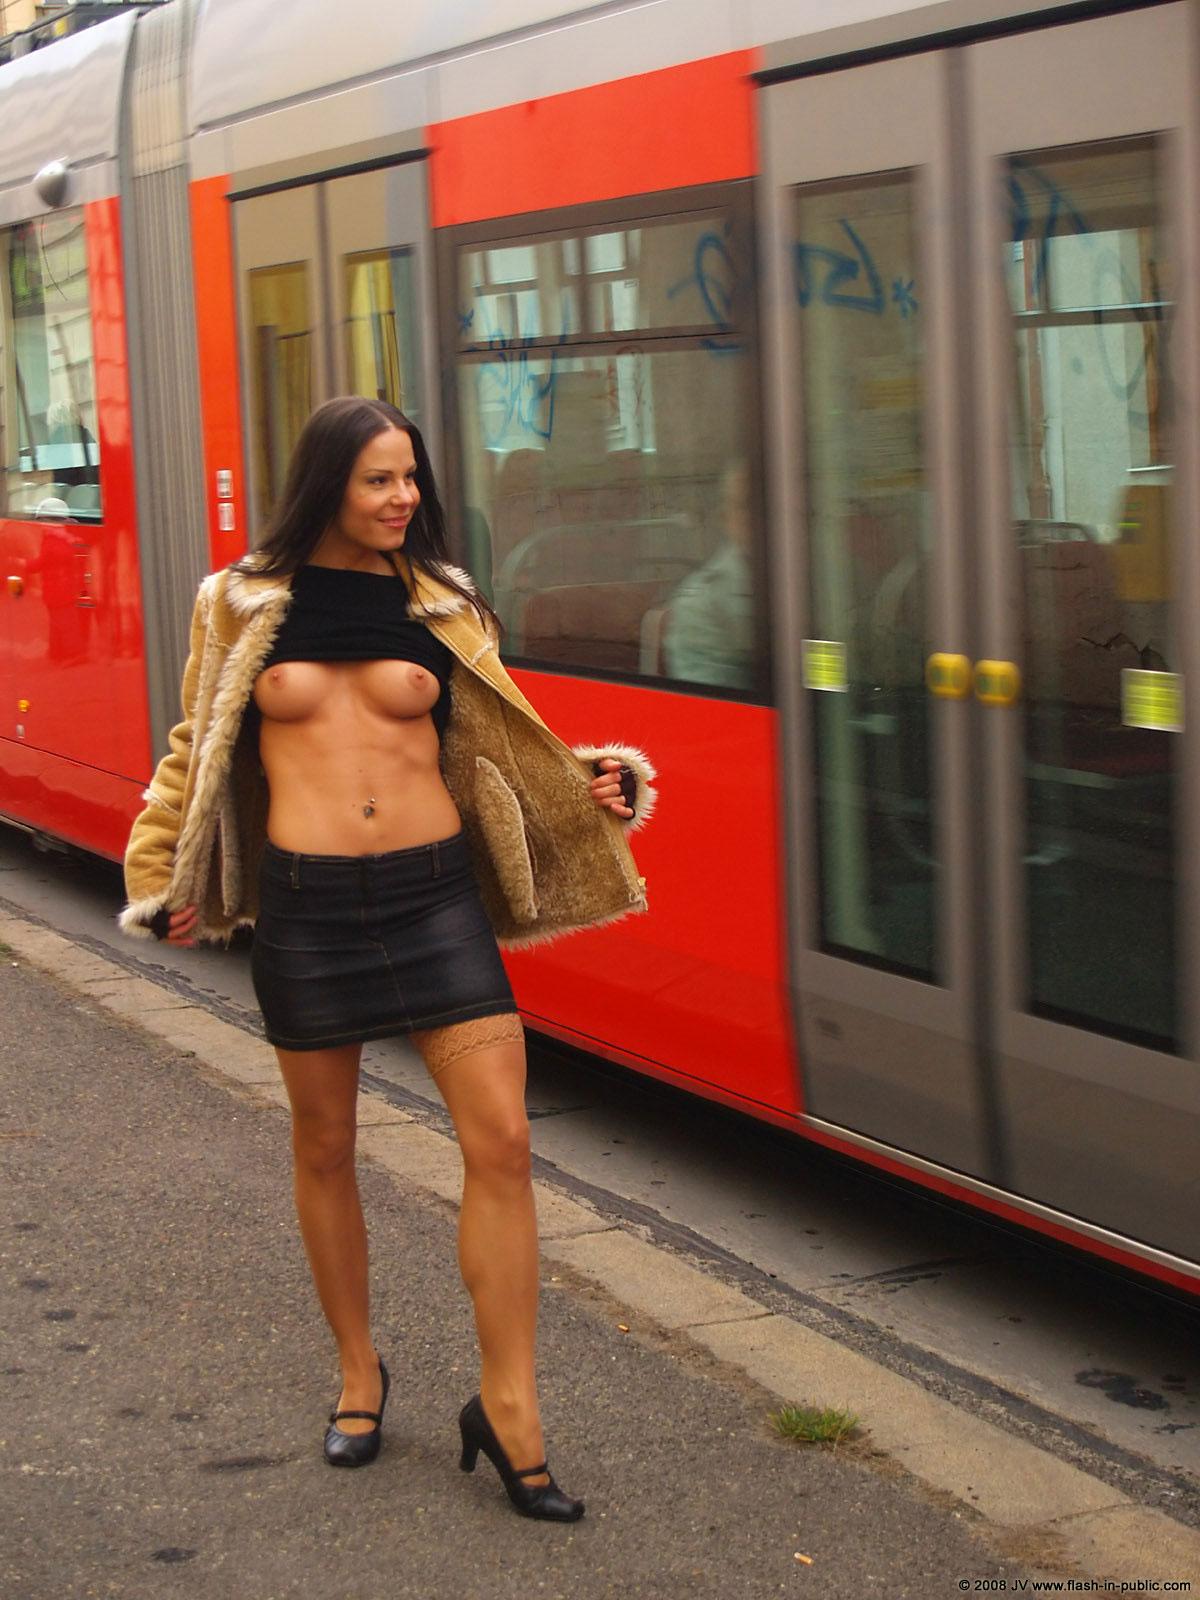 alexandra-g-bottomless-stockings-flash-in-public-38